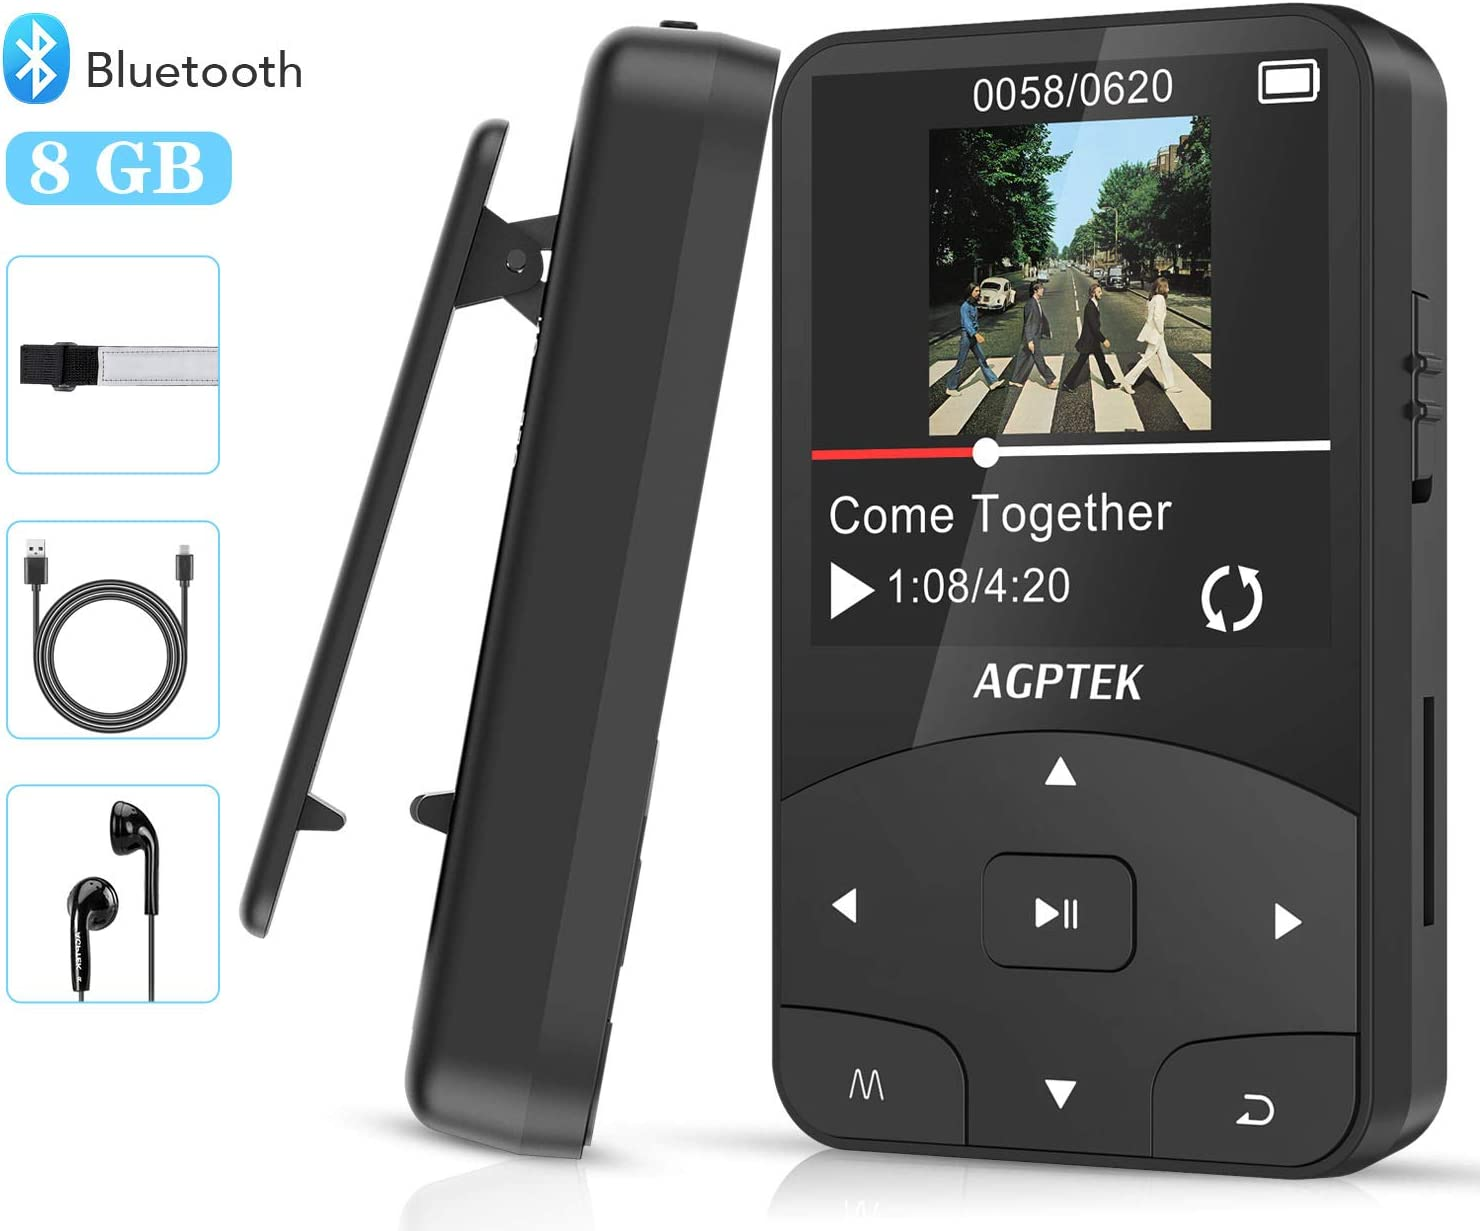 AGPTEK Reproductor MP3 Bluetooth Running, A58 HiFi Reproductor de Música 8GB con Podómetro, Radio FM, Grabación de Voz, E-Book, Soporta TF hasta 128GB, Negro